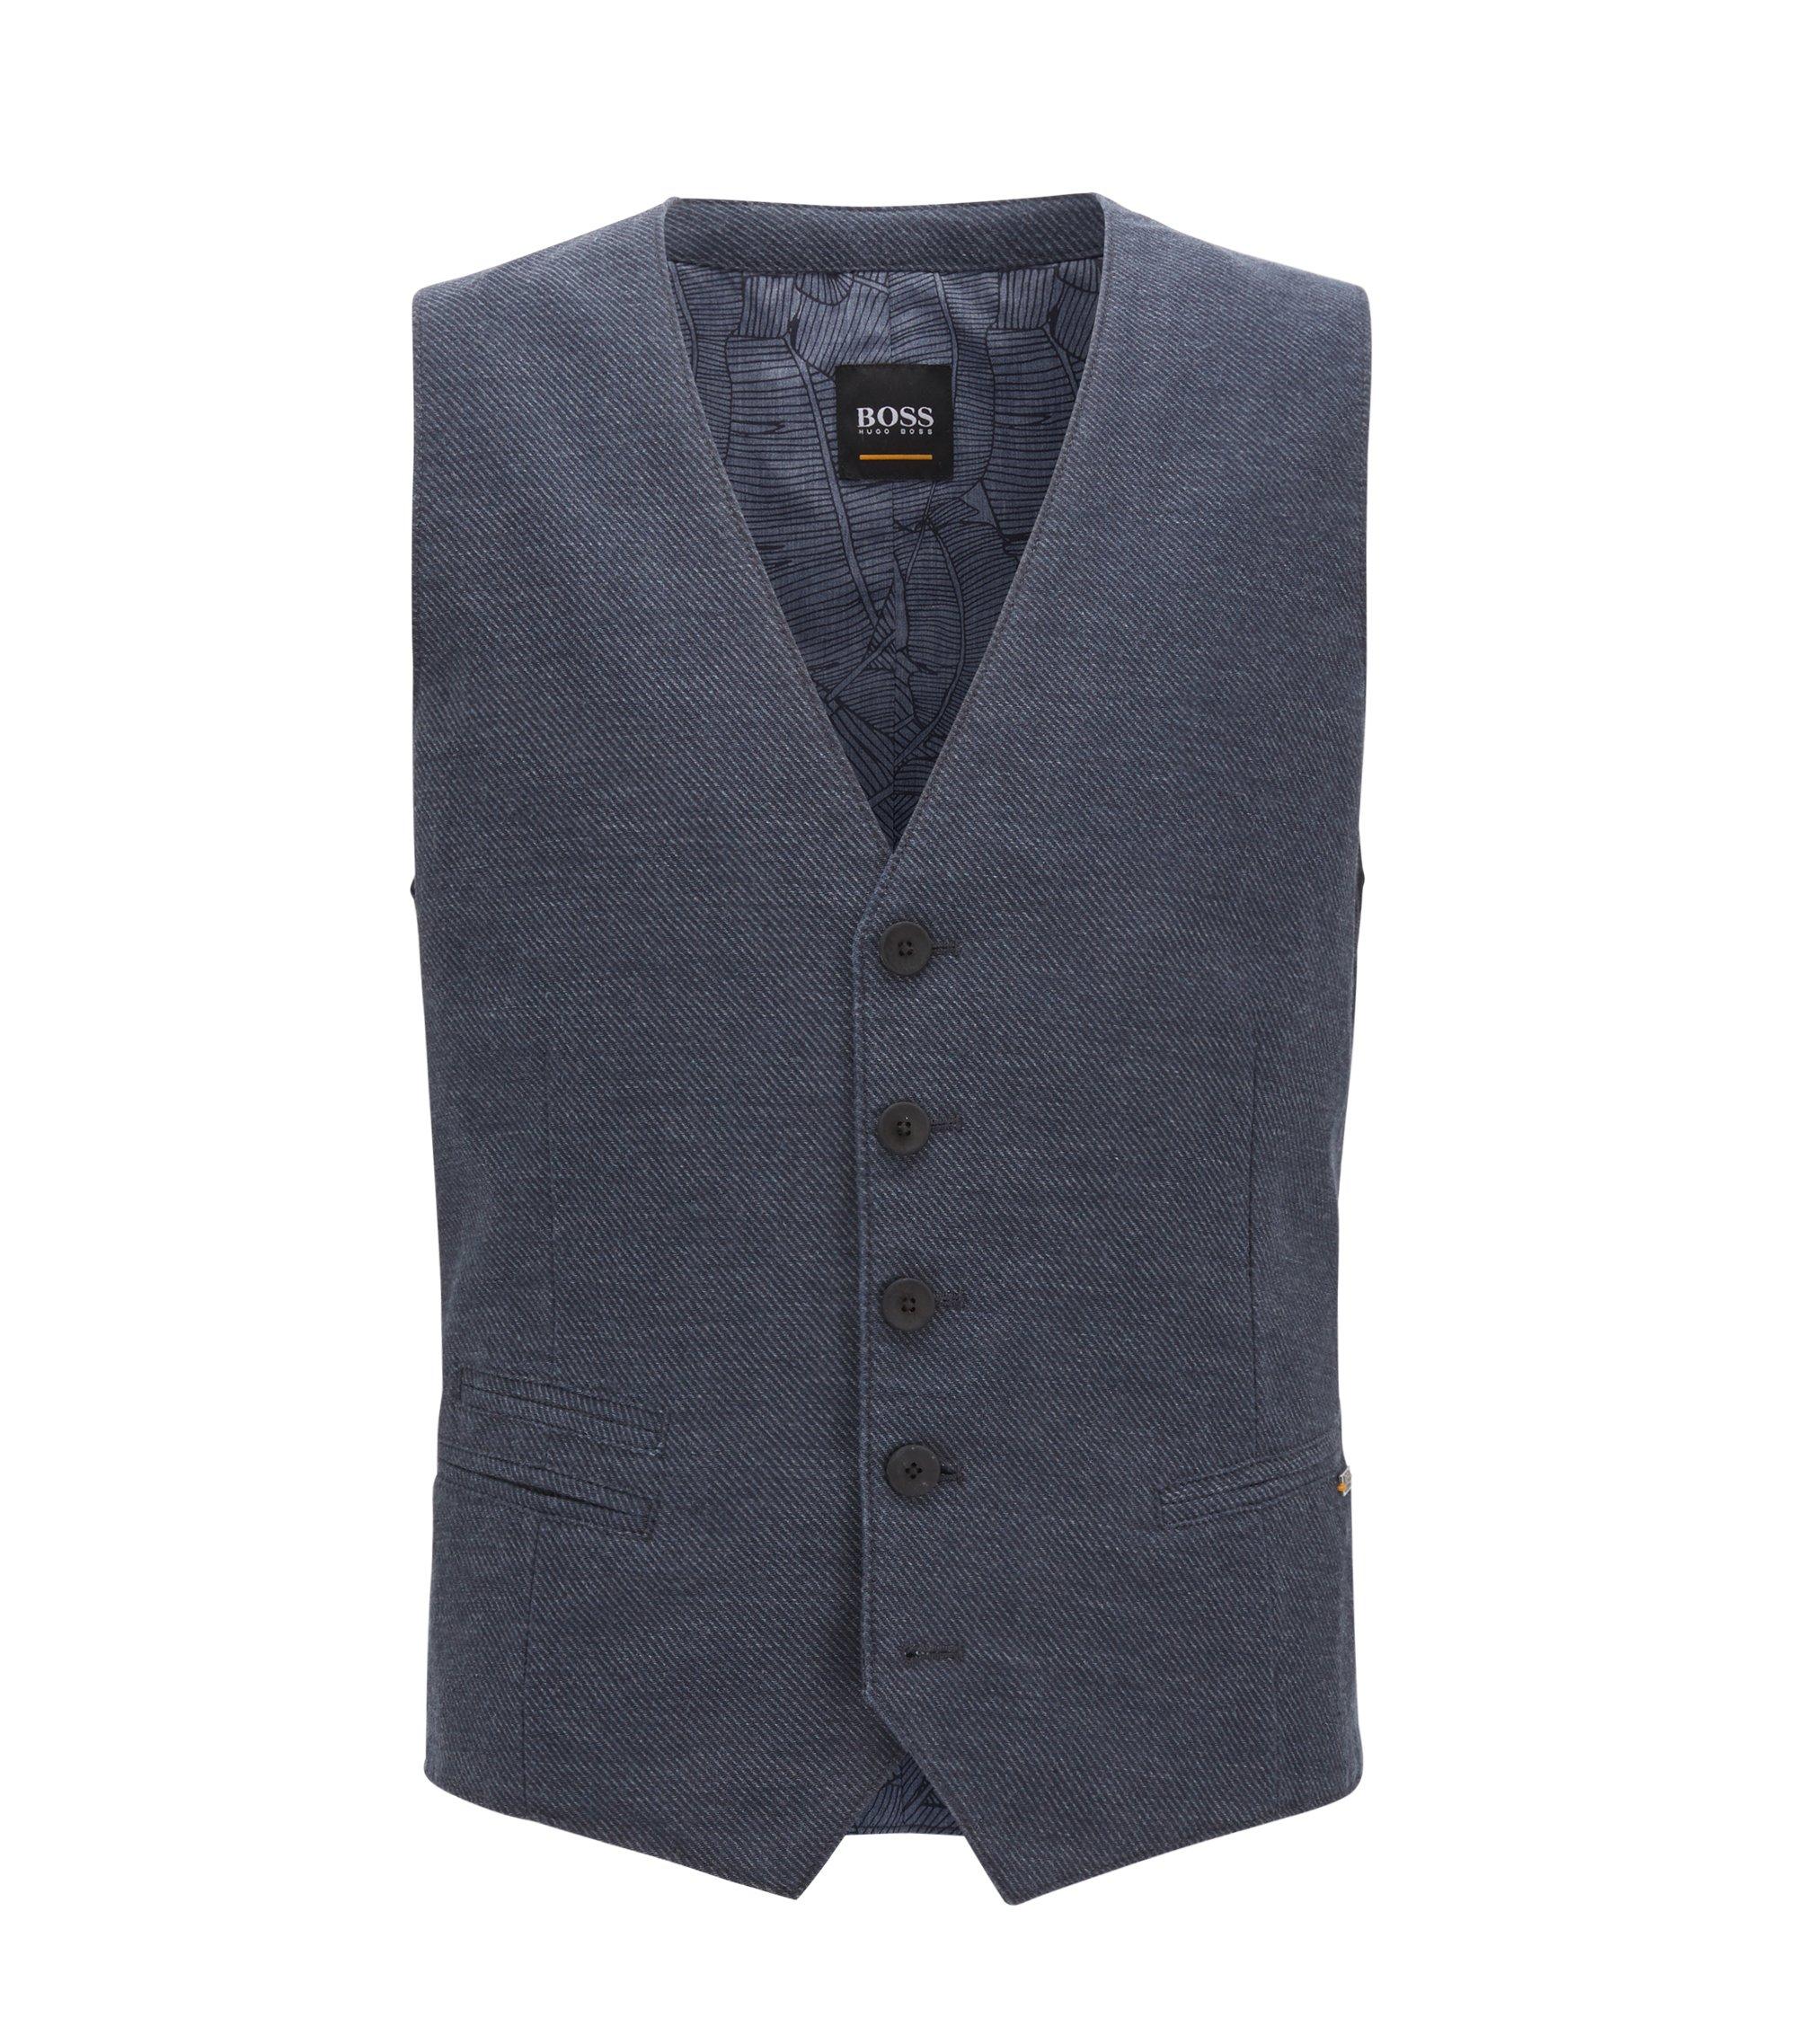 Cotton Linen Blend Waistcoat, Slim Fit | Baster BS W, Dark Blue